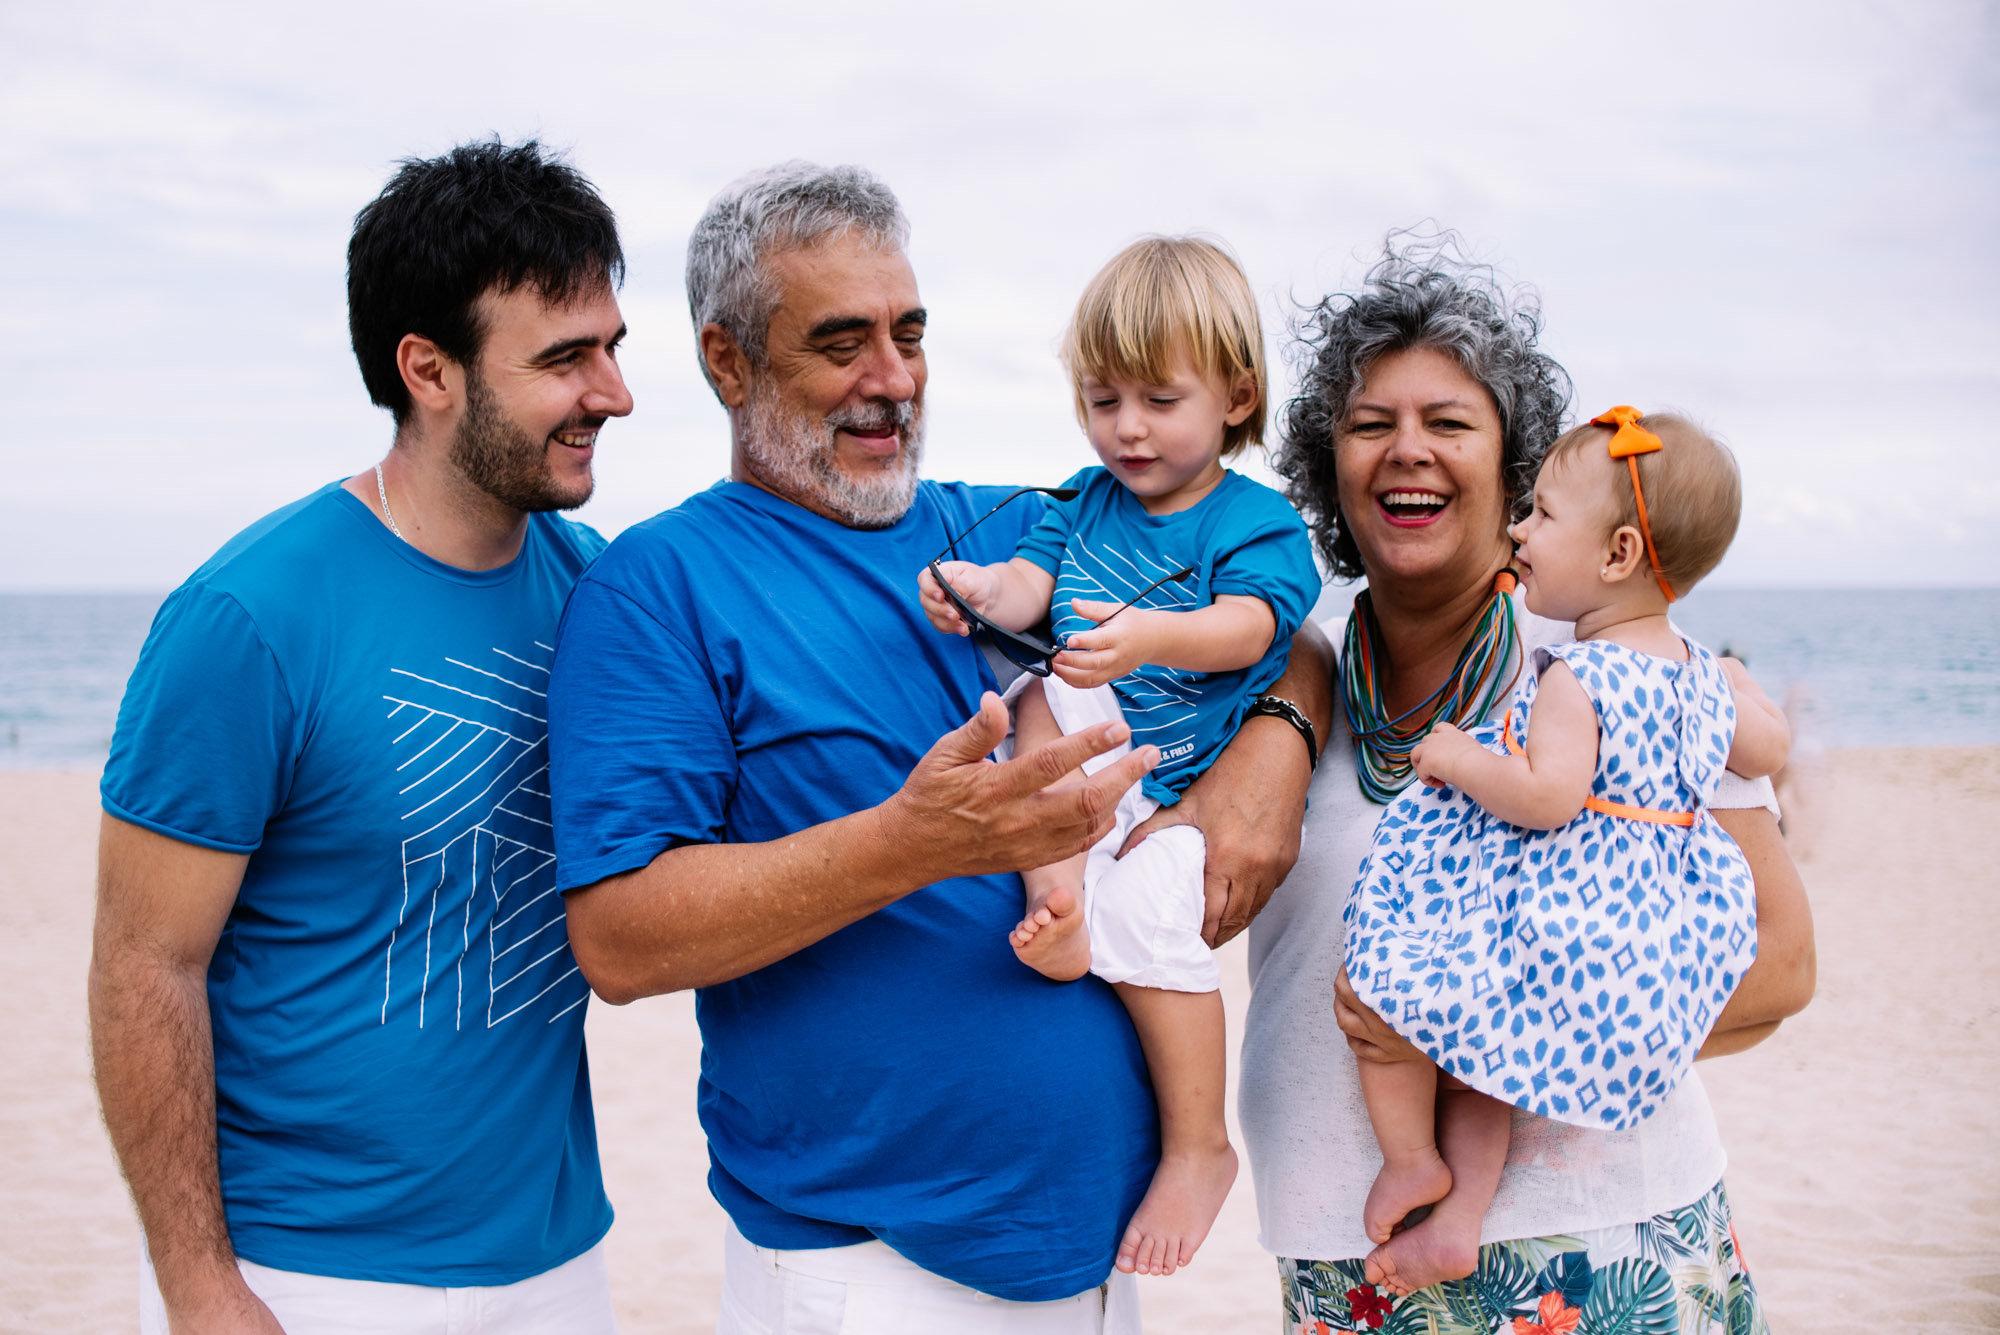 foto de familia na praia